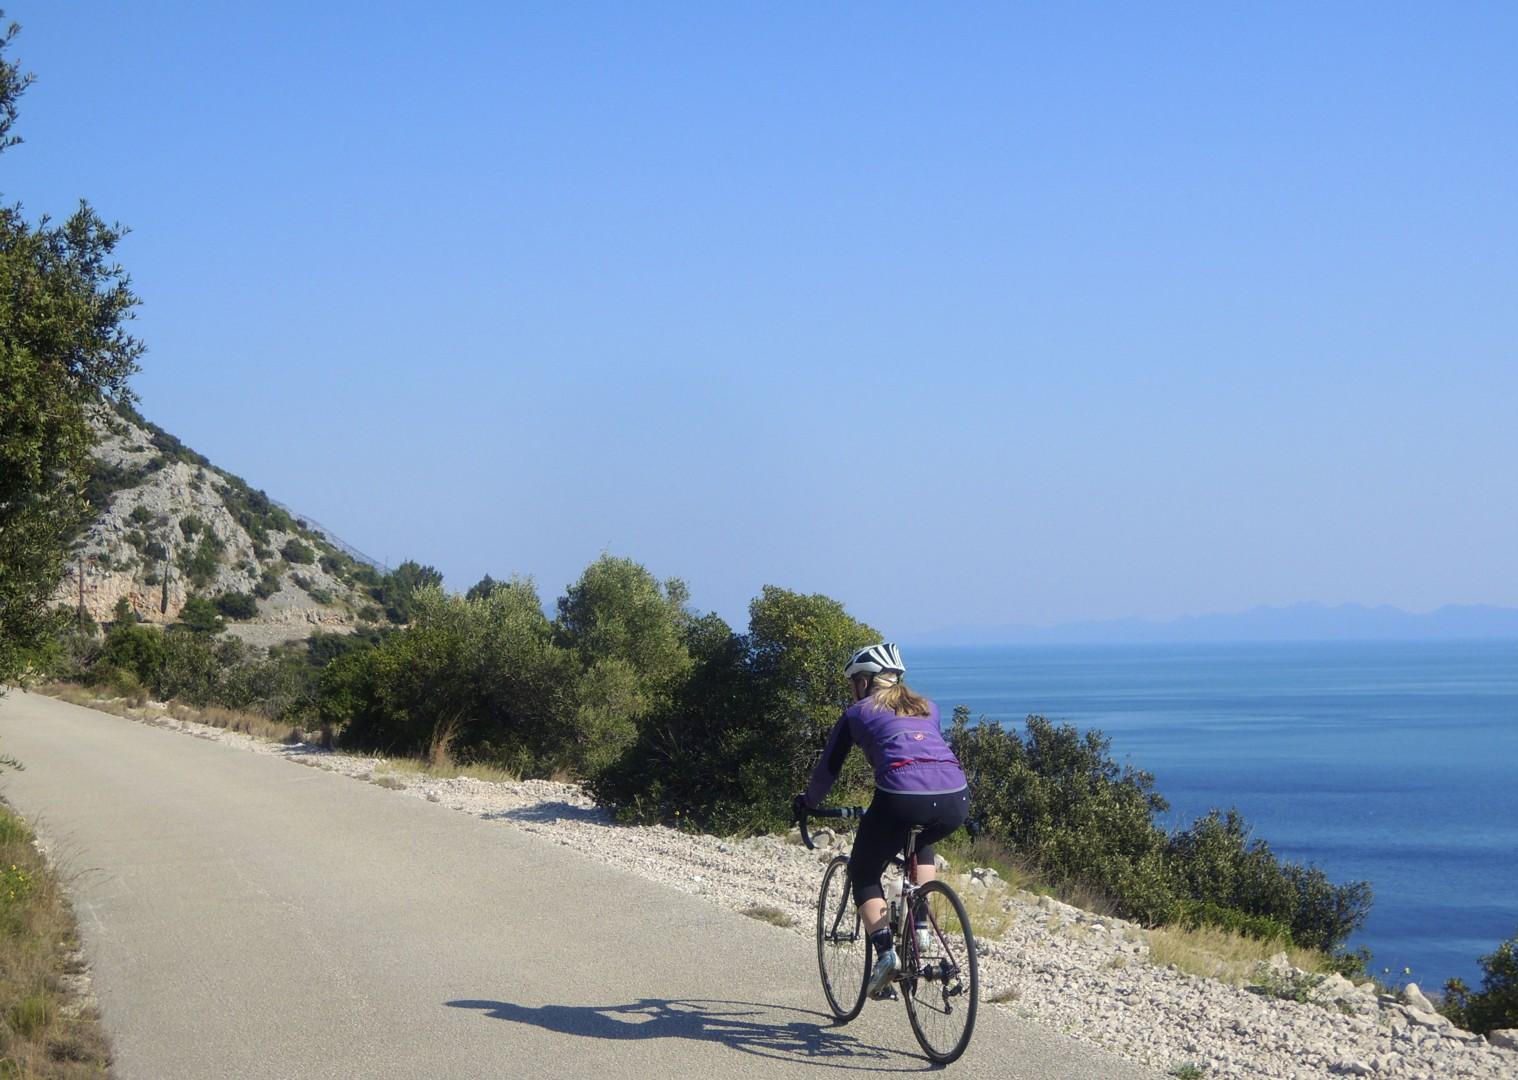 croatiaroad8.jpg - Slovenia and Croatia - Slovenian Alps to Dalmatian Coast - Guided Road Cycling Holiday - Road Cycling